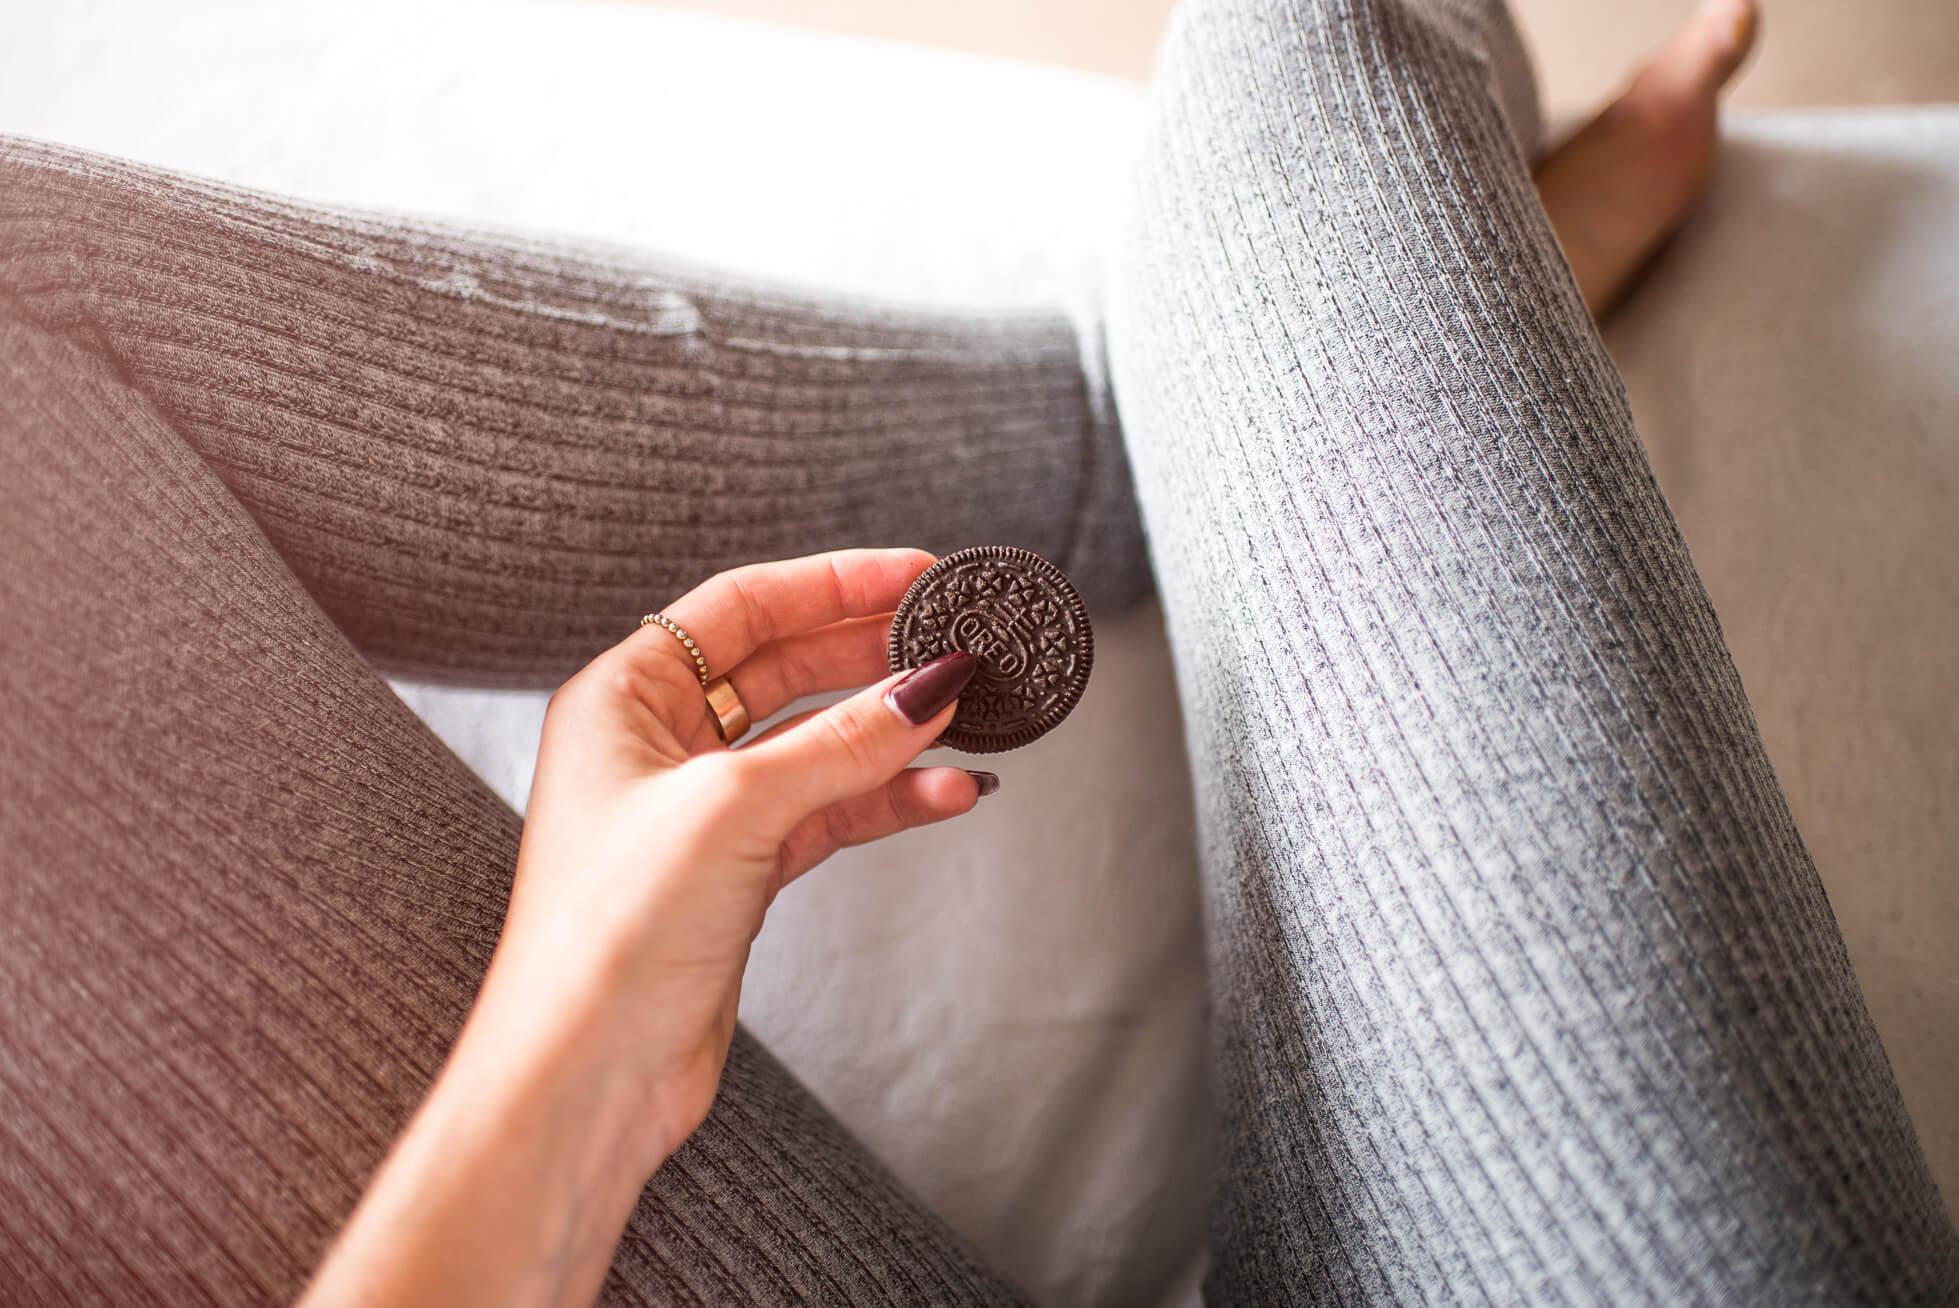 janni-deler-cookies-milkDSC_7165-2-Redigera